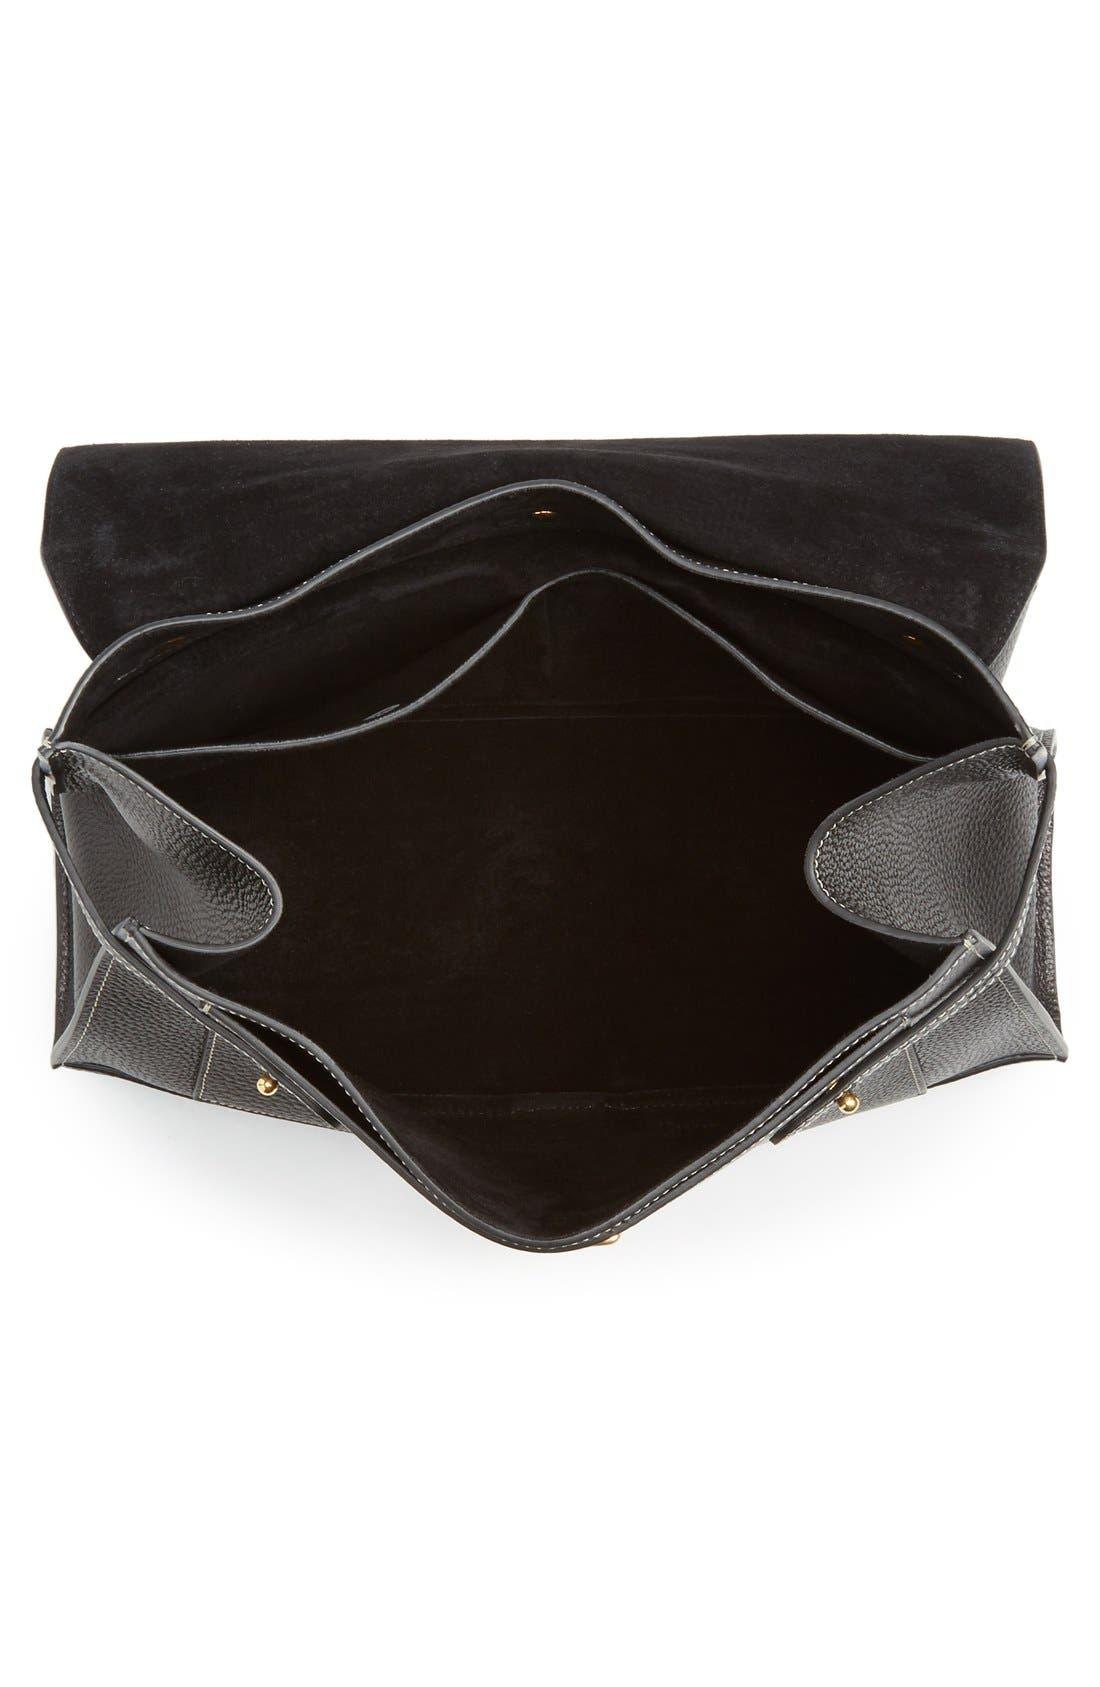 'Small Buckle' Leather Shoulder Bag,                             Alternate thumbnail 4, color,                             001